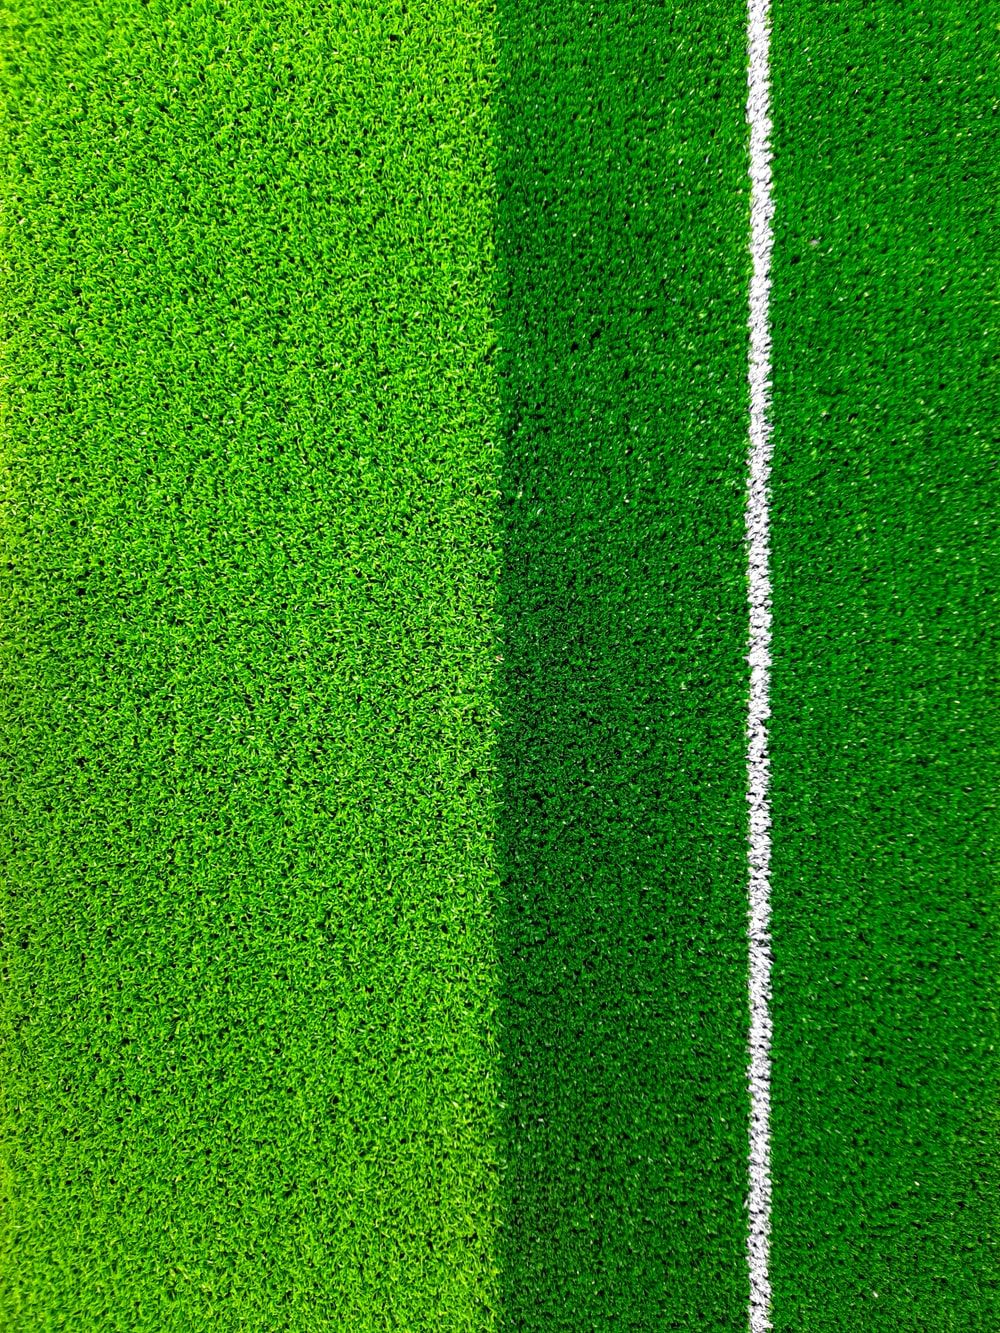 green and black stripe textile